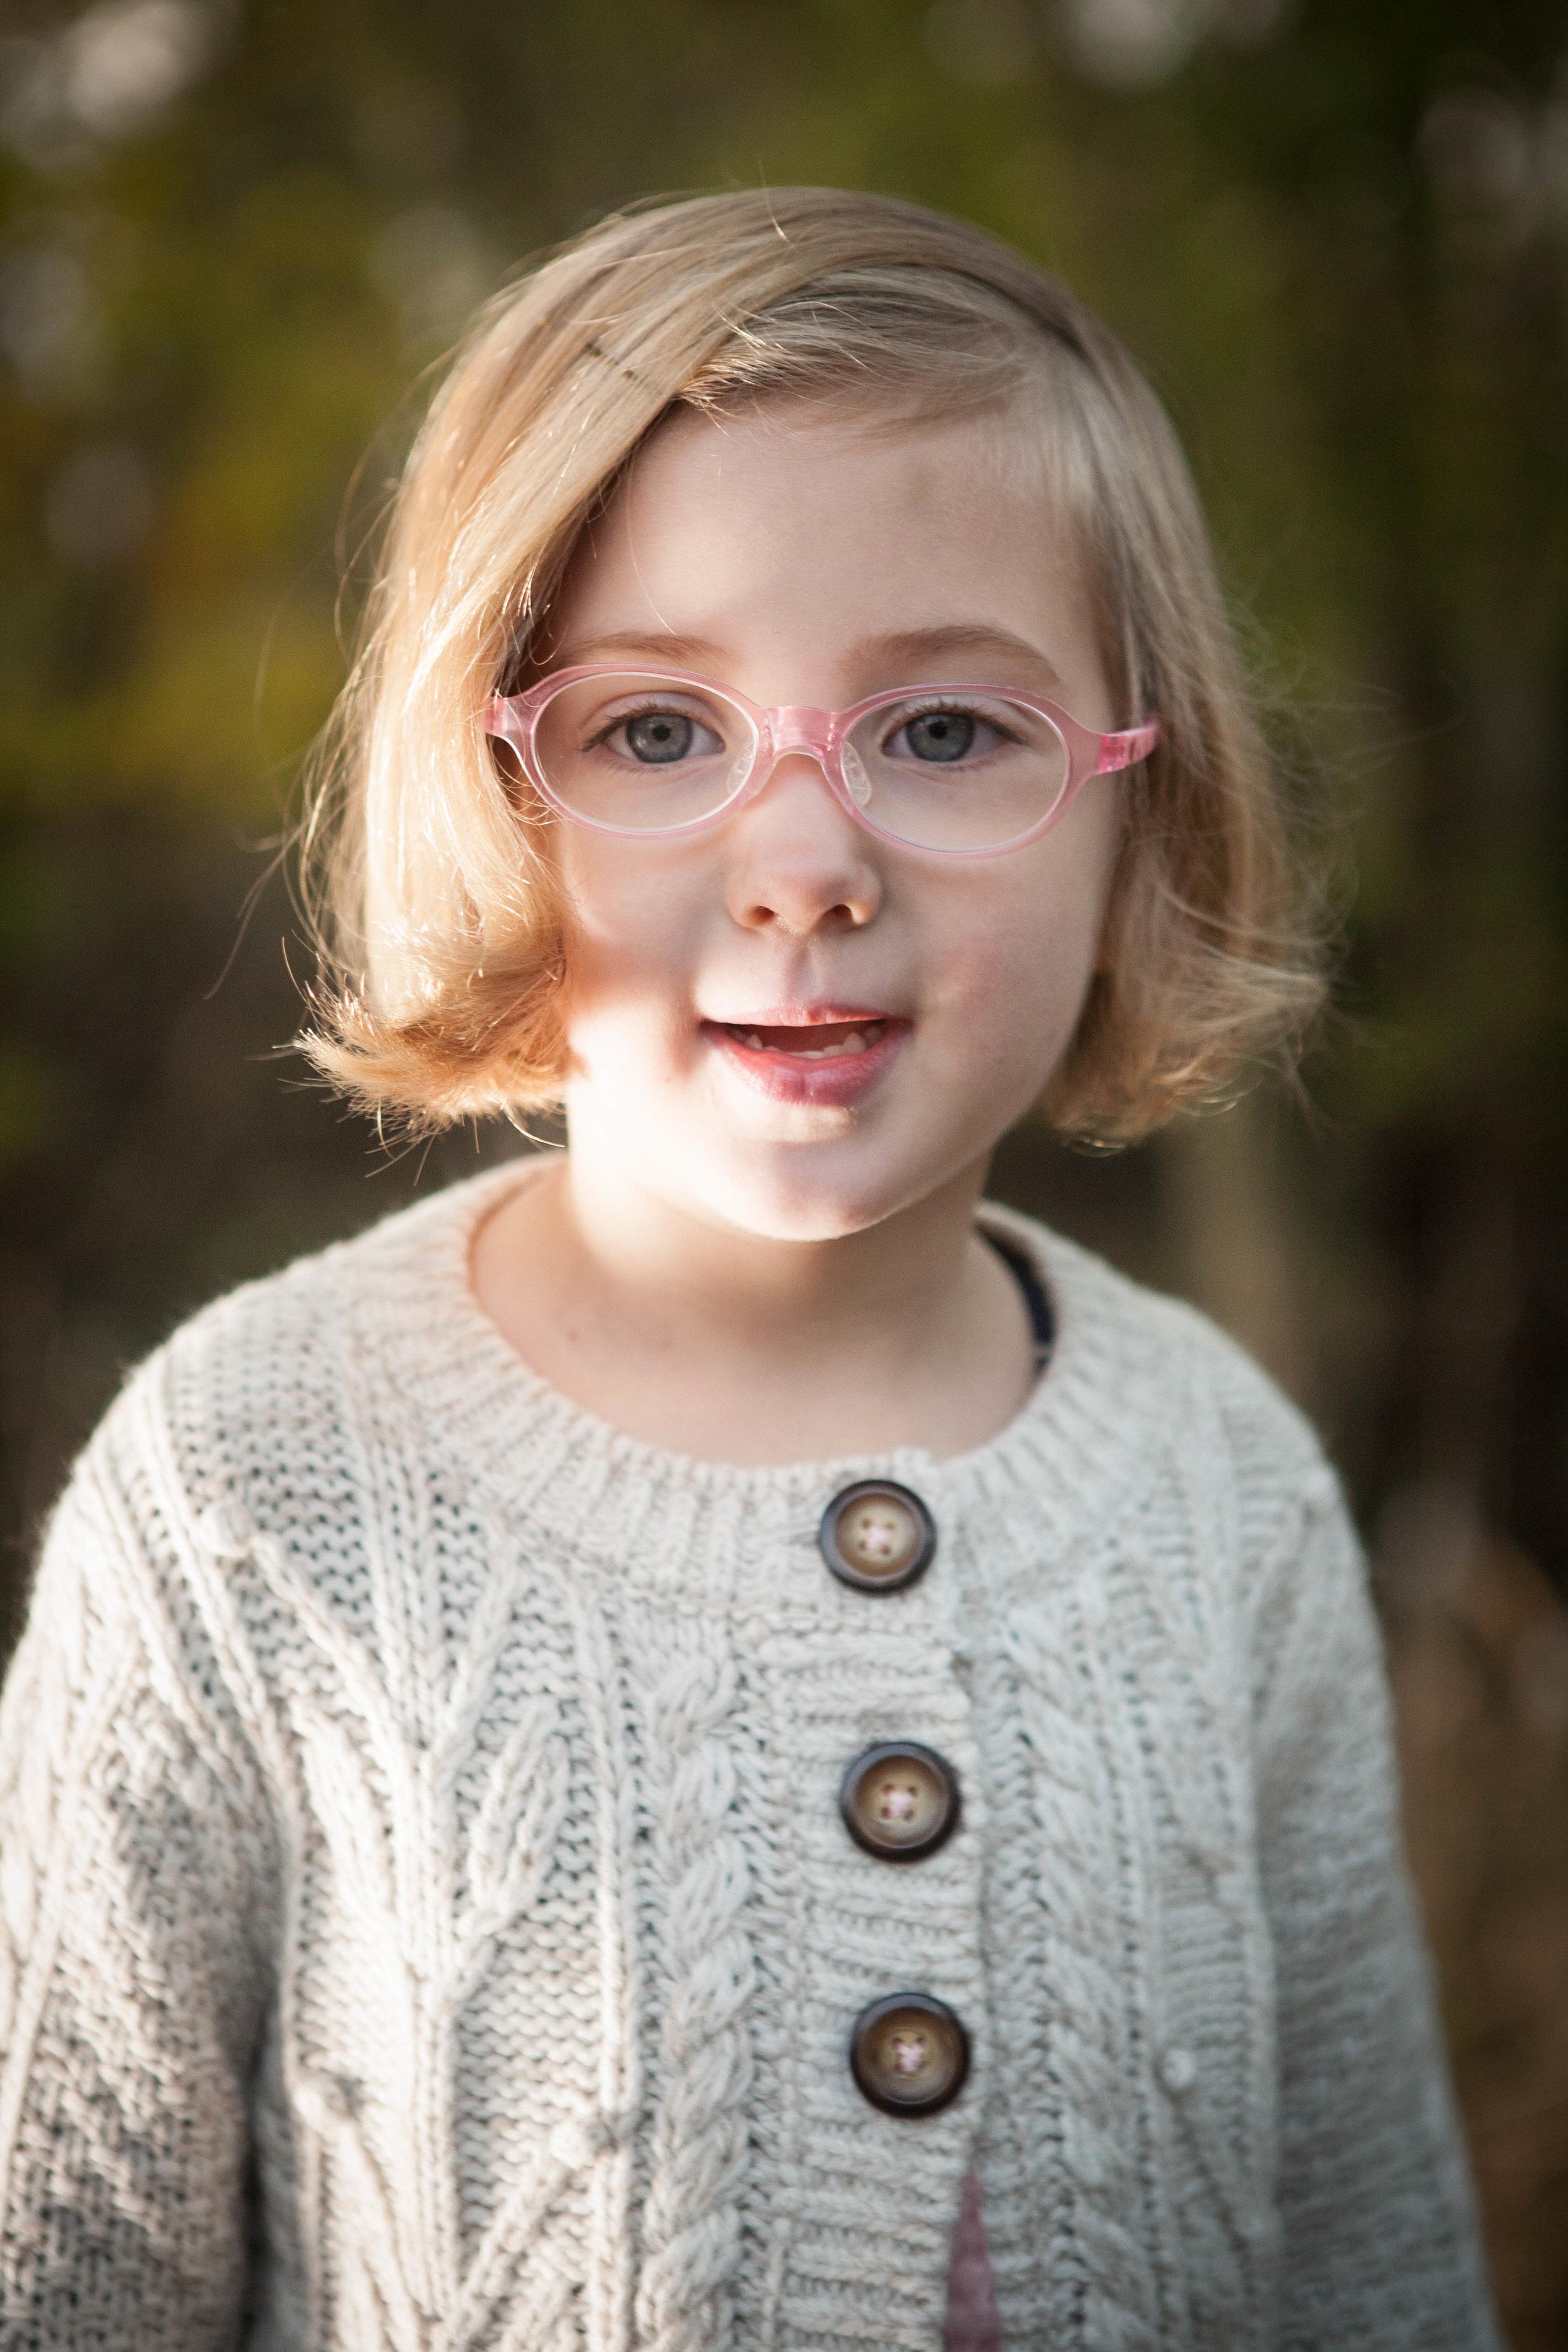 childrens photography studio chicago